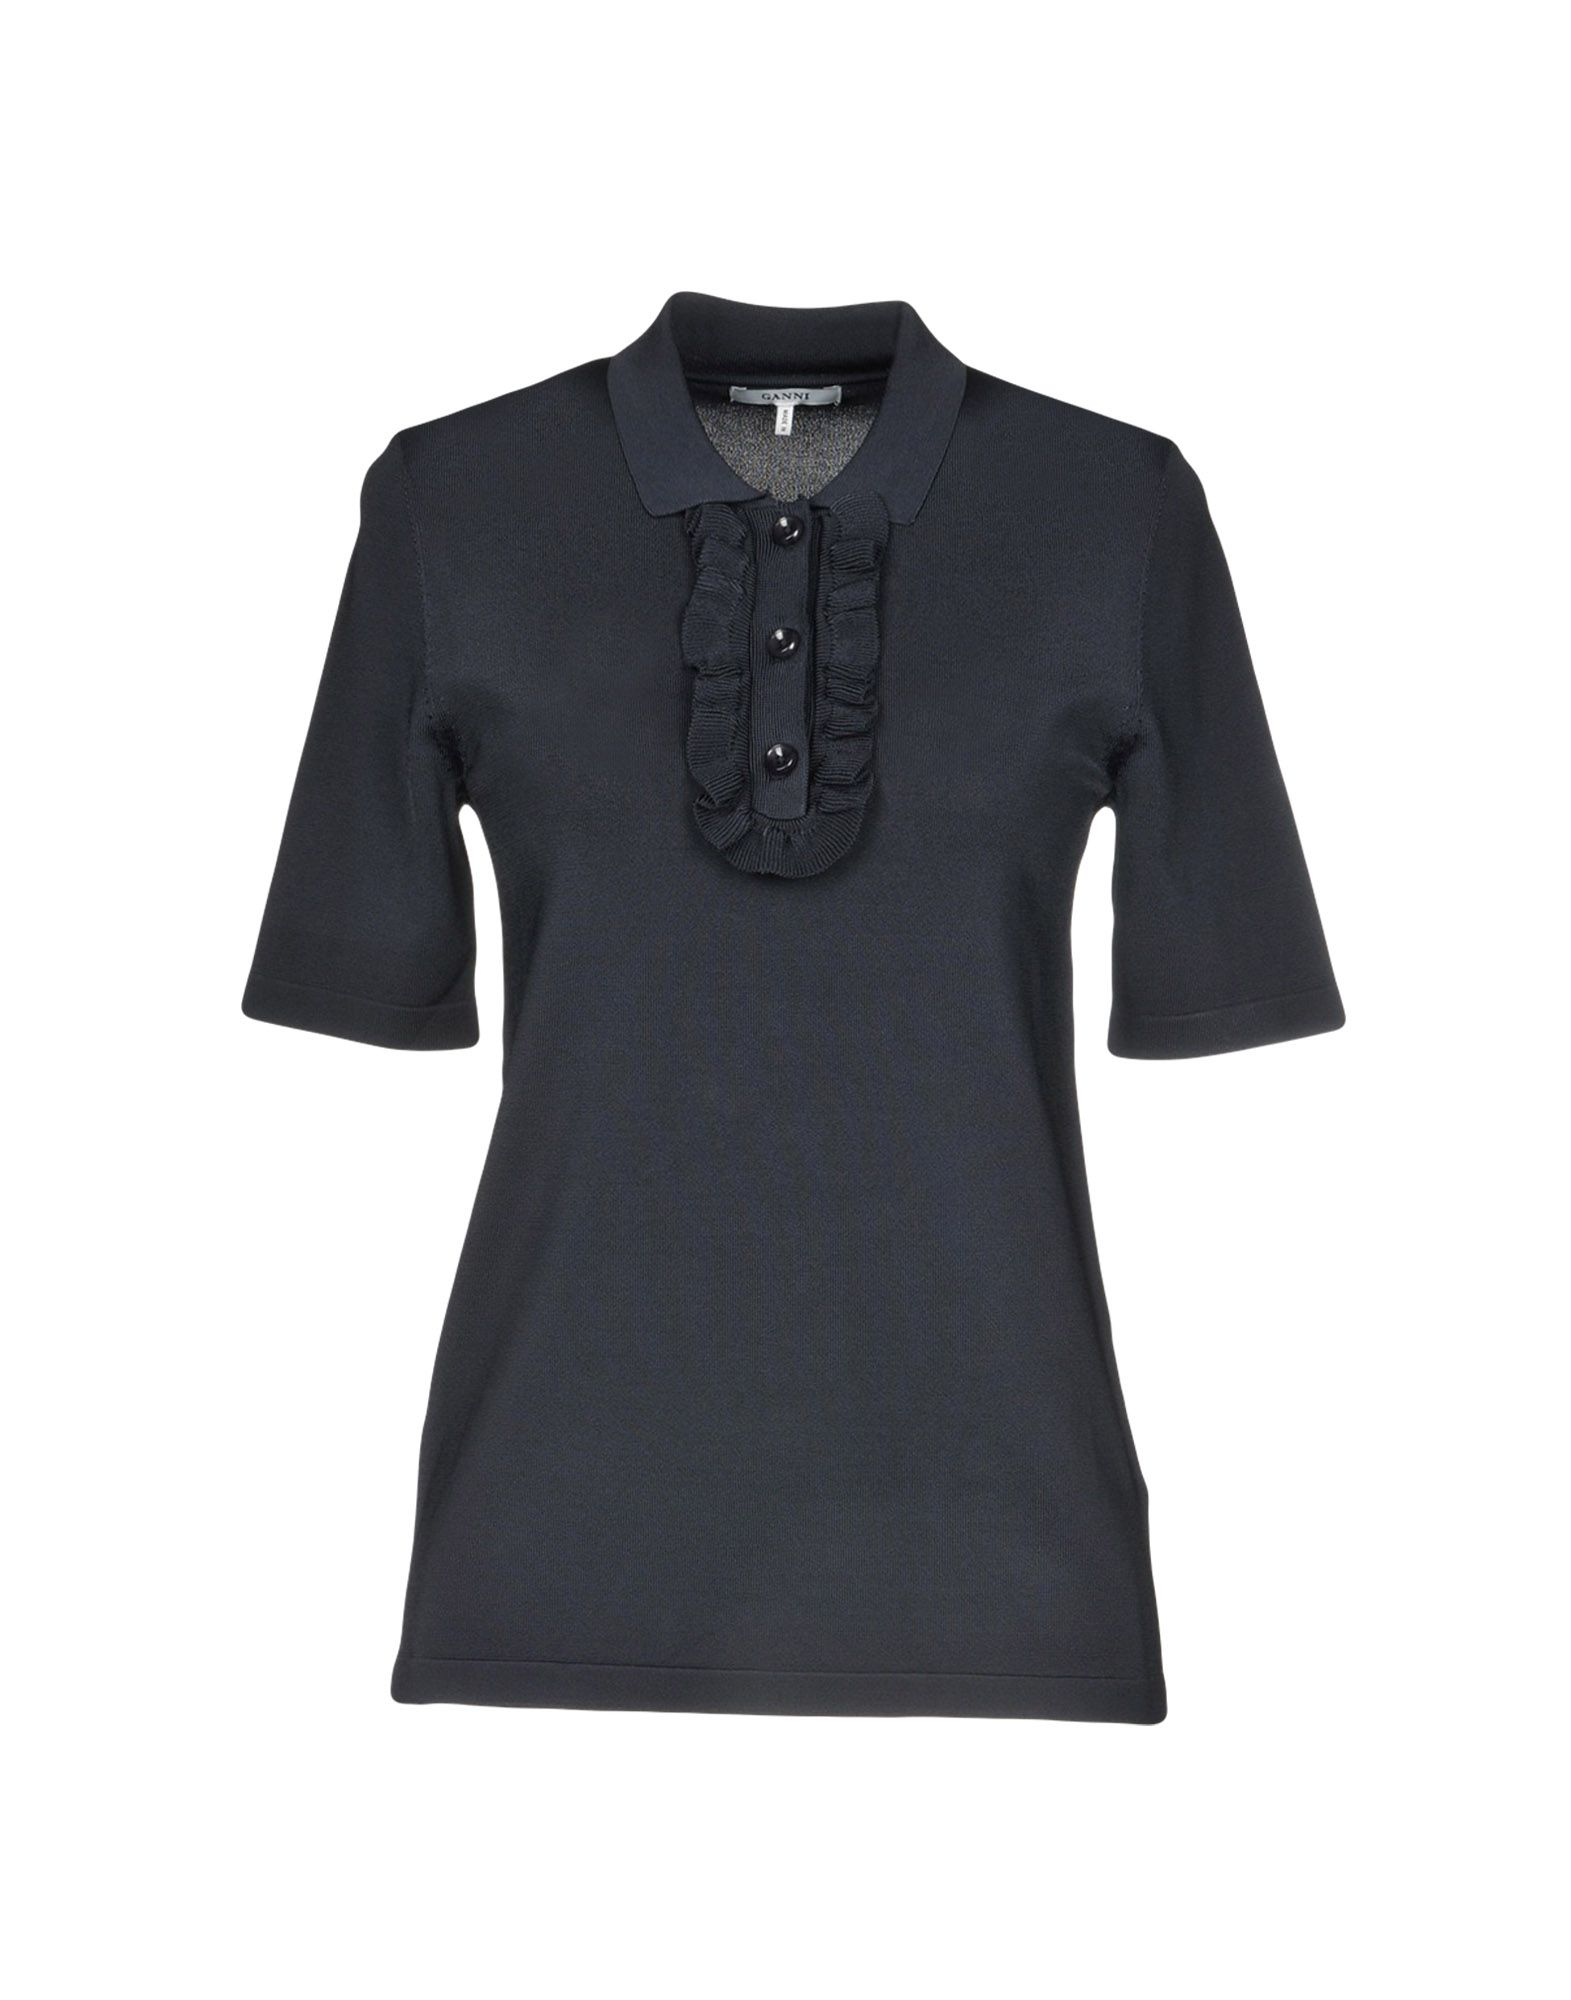 GANNI Polo shirts. Jersey Ruffles Basic solid color Polo collar Short sleeves Front closure Button closing No pockets Small sized. 69% Viscose, 31% Polyamide